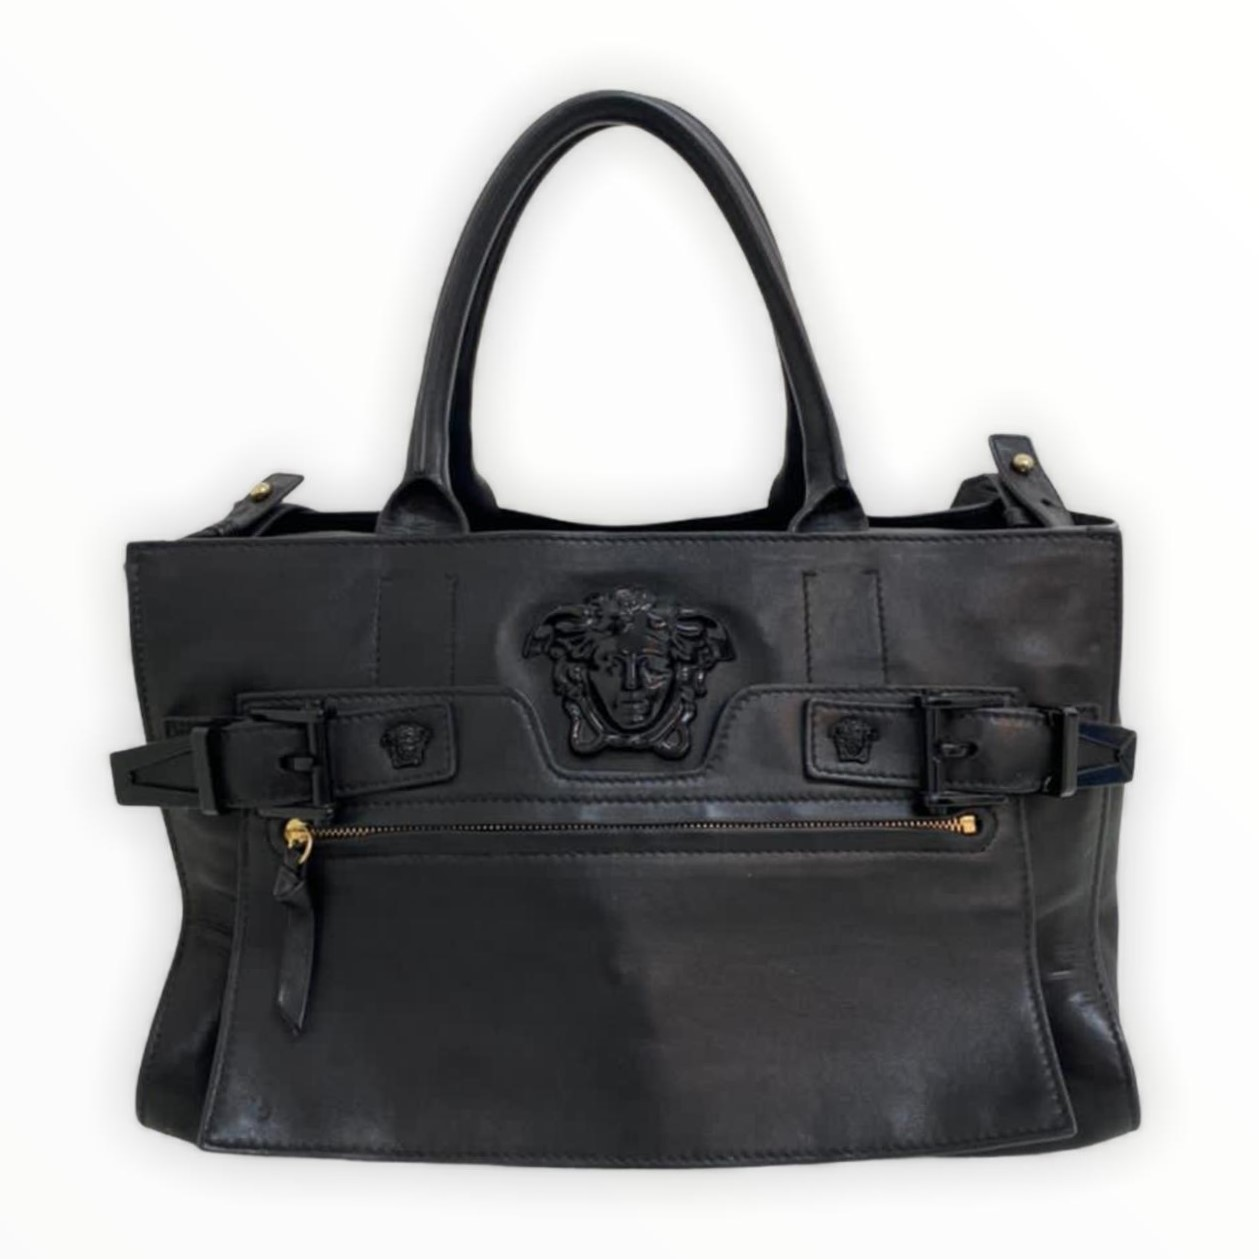 Bolsa Versace Preta Tote